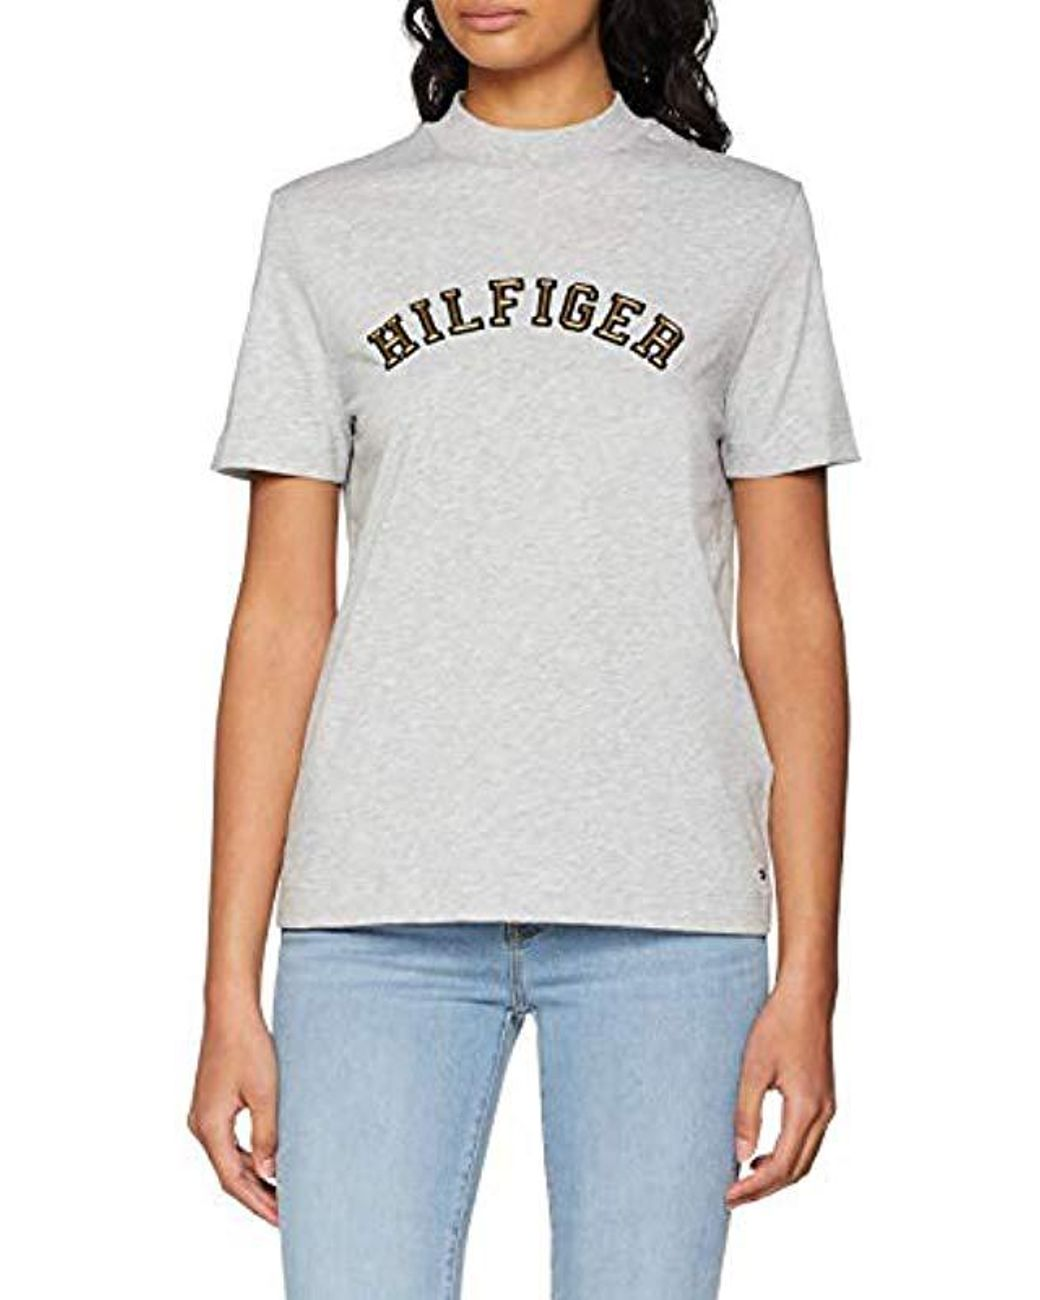 Tommy Hilfiger Slogan W T-Shirt